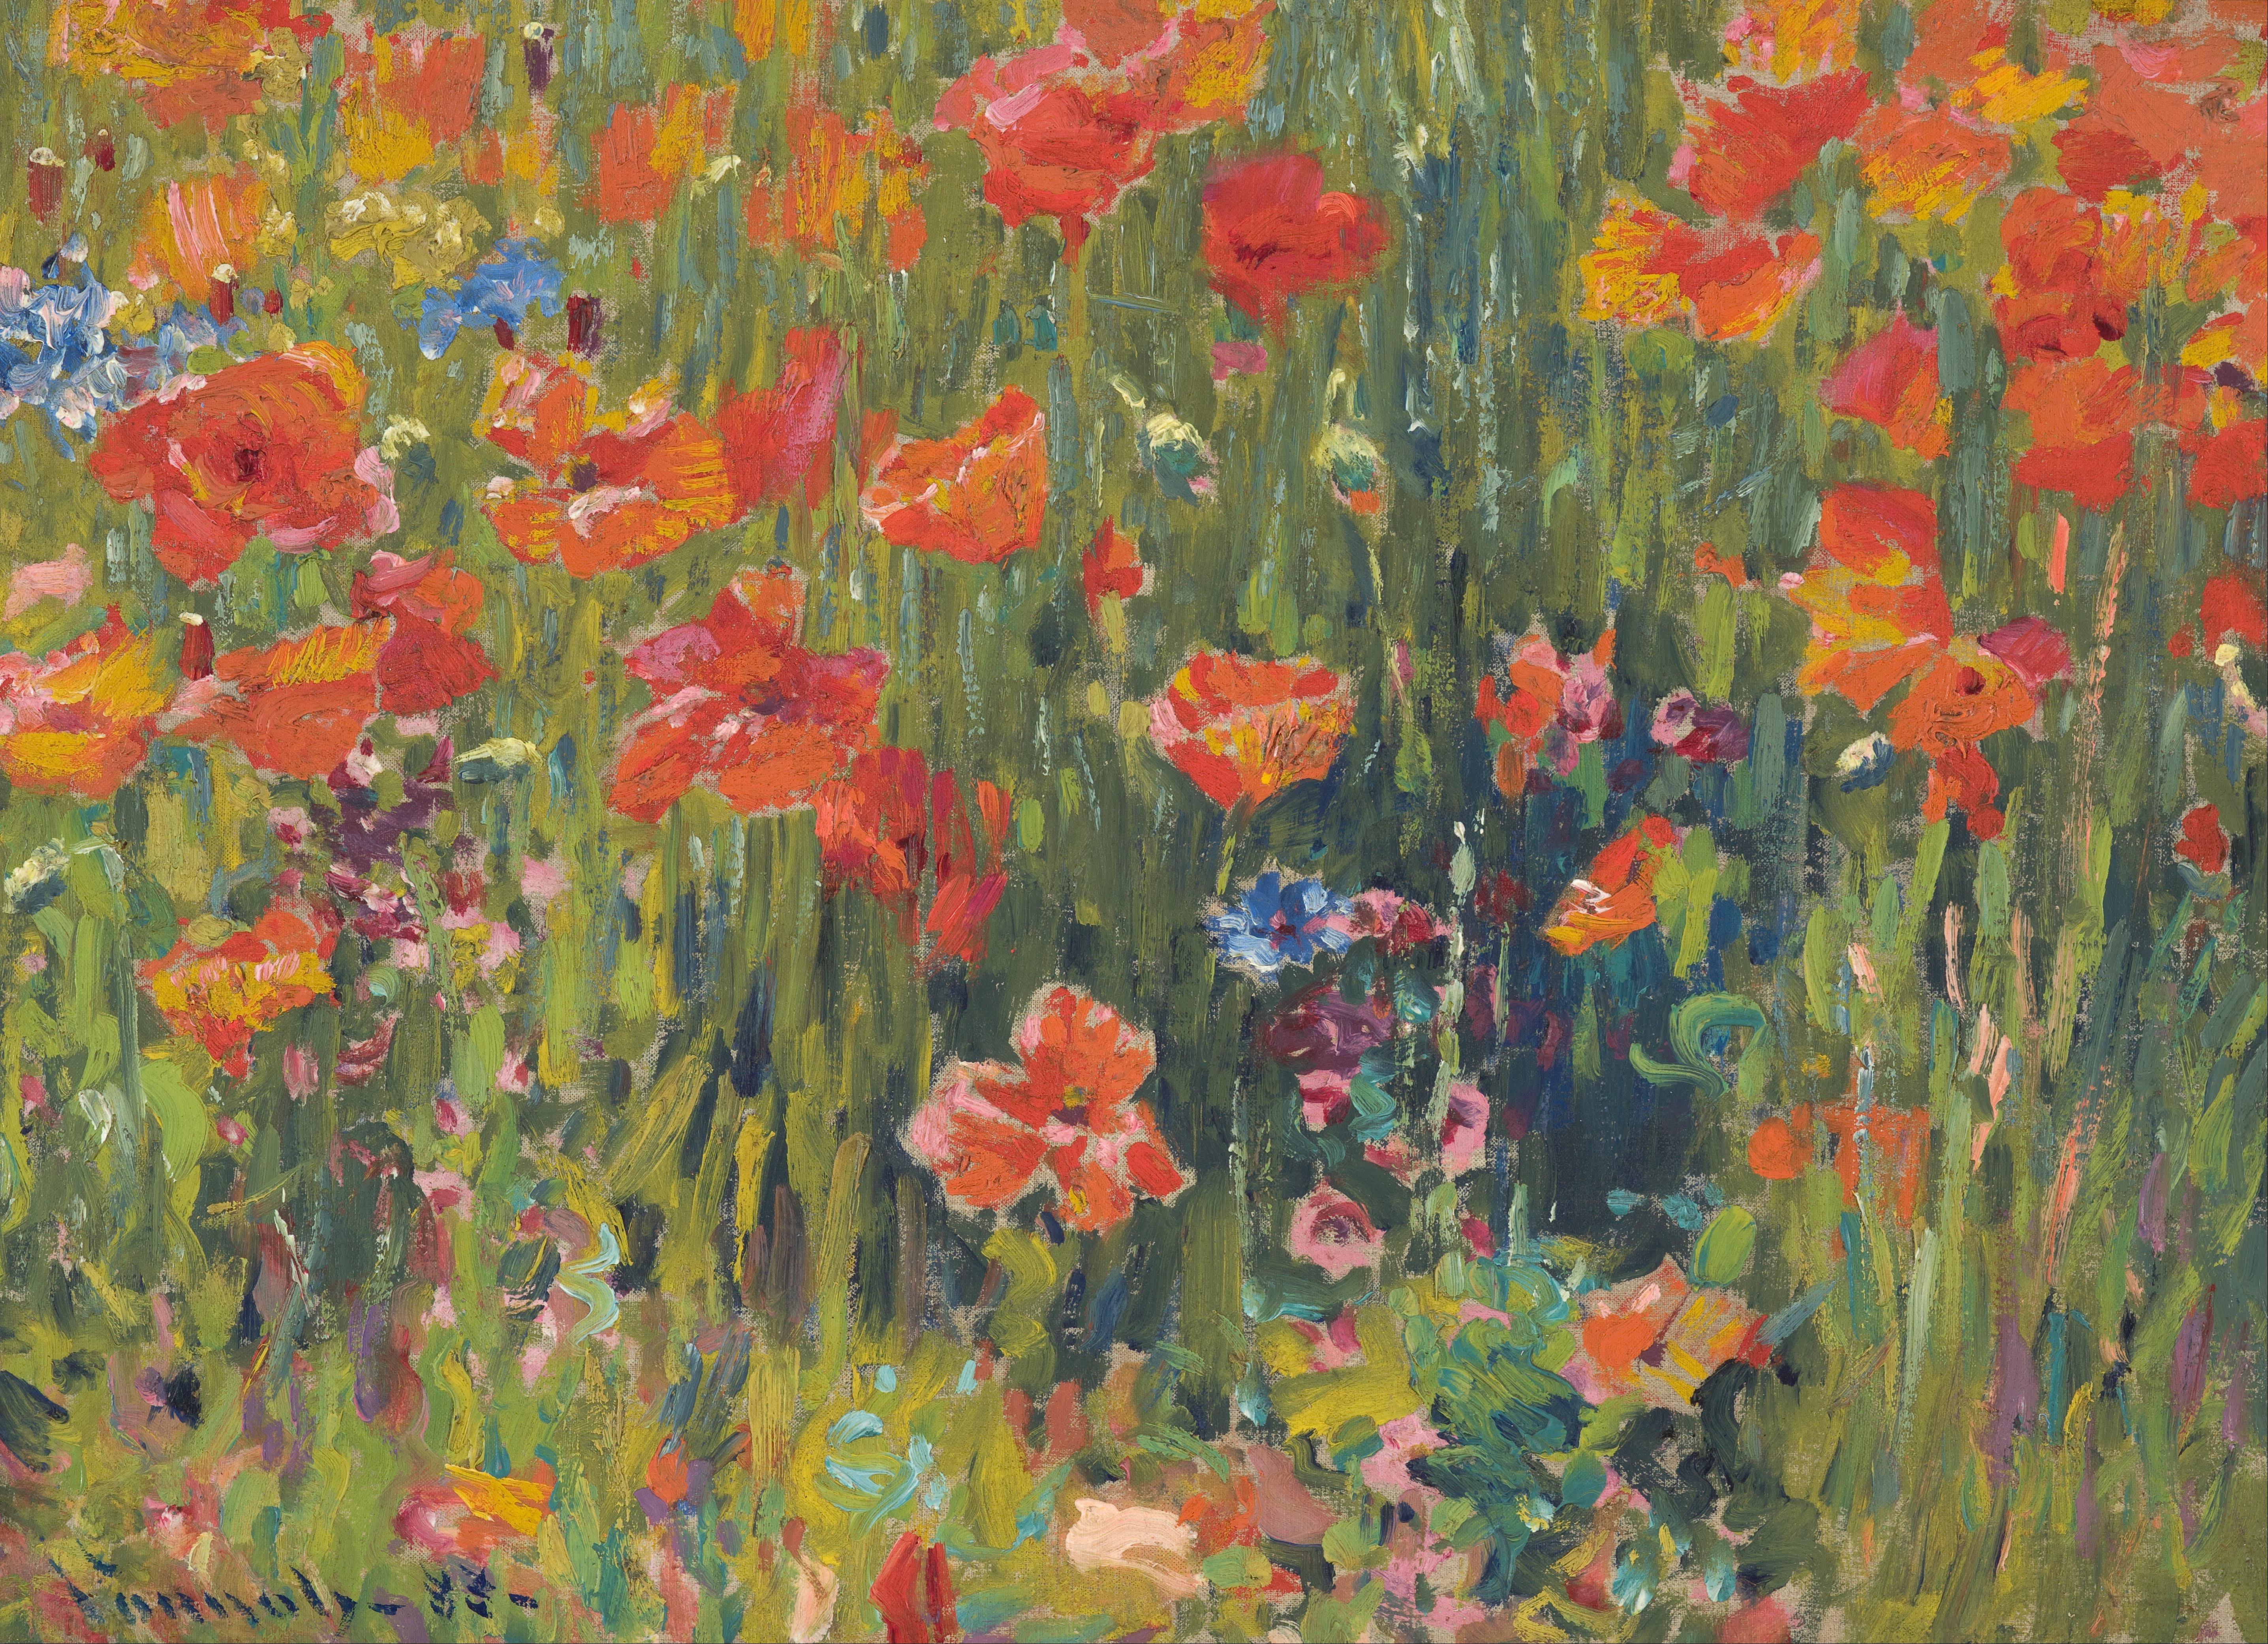 File vonnoh robert william poppies google art project for Imagenes de cuadros abstractos famosos